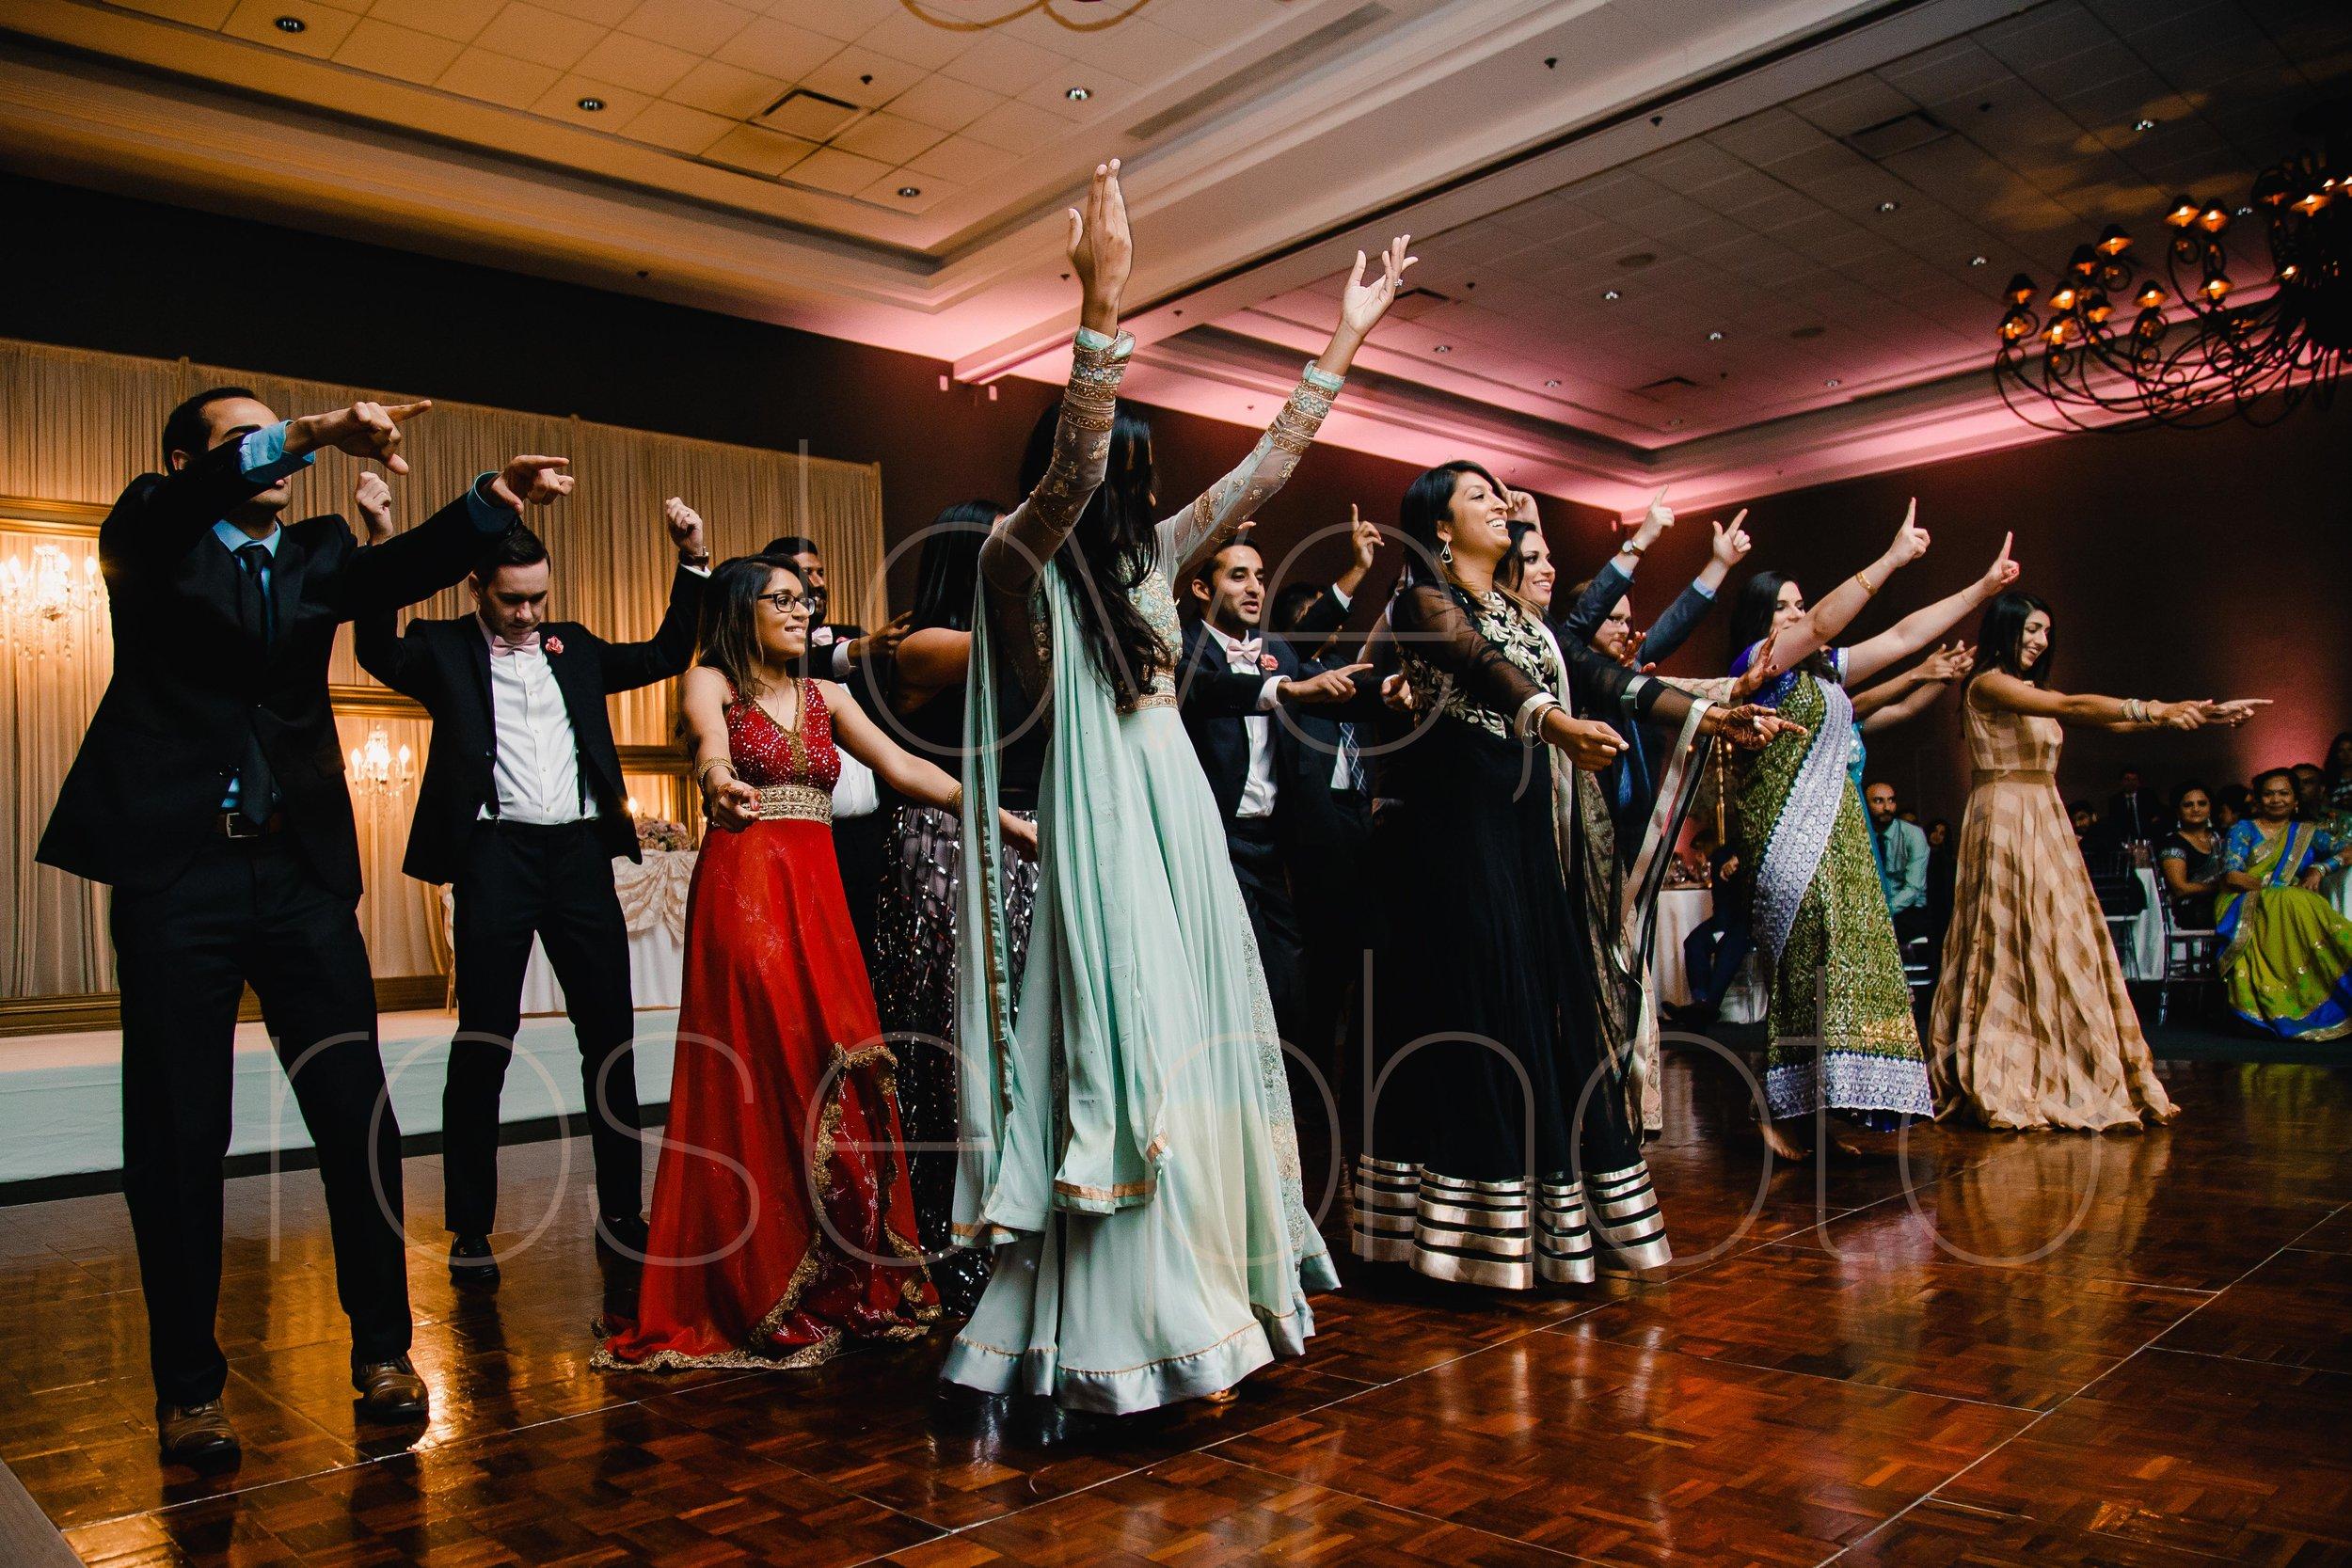 Chicago Indian Wedding best photography lifestyle wedding portrait luxury wedding-59.jpg